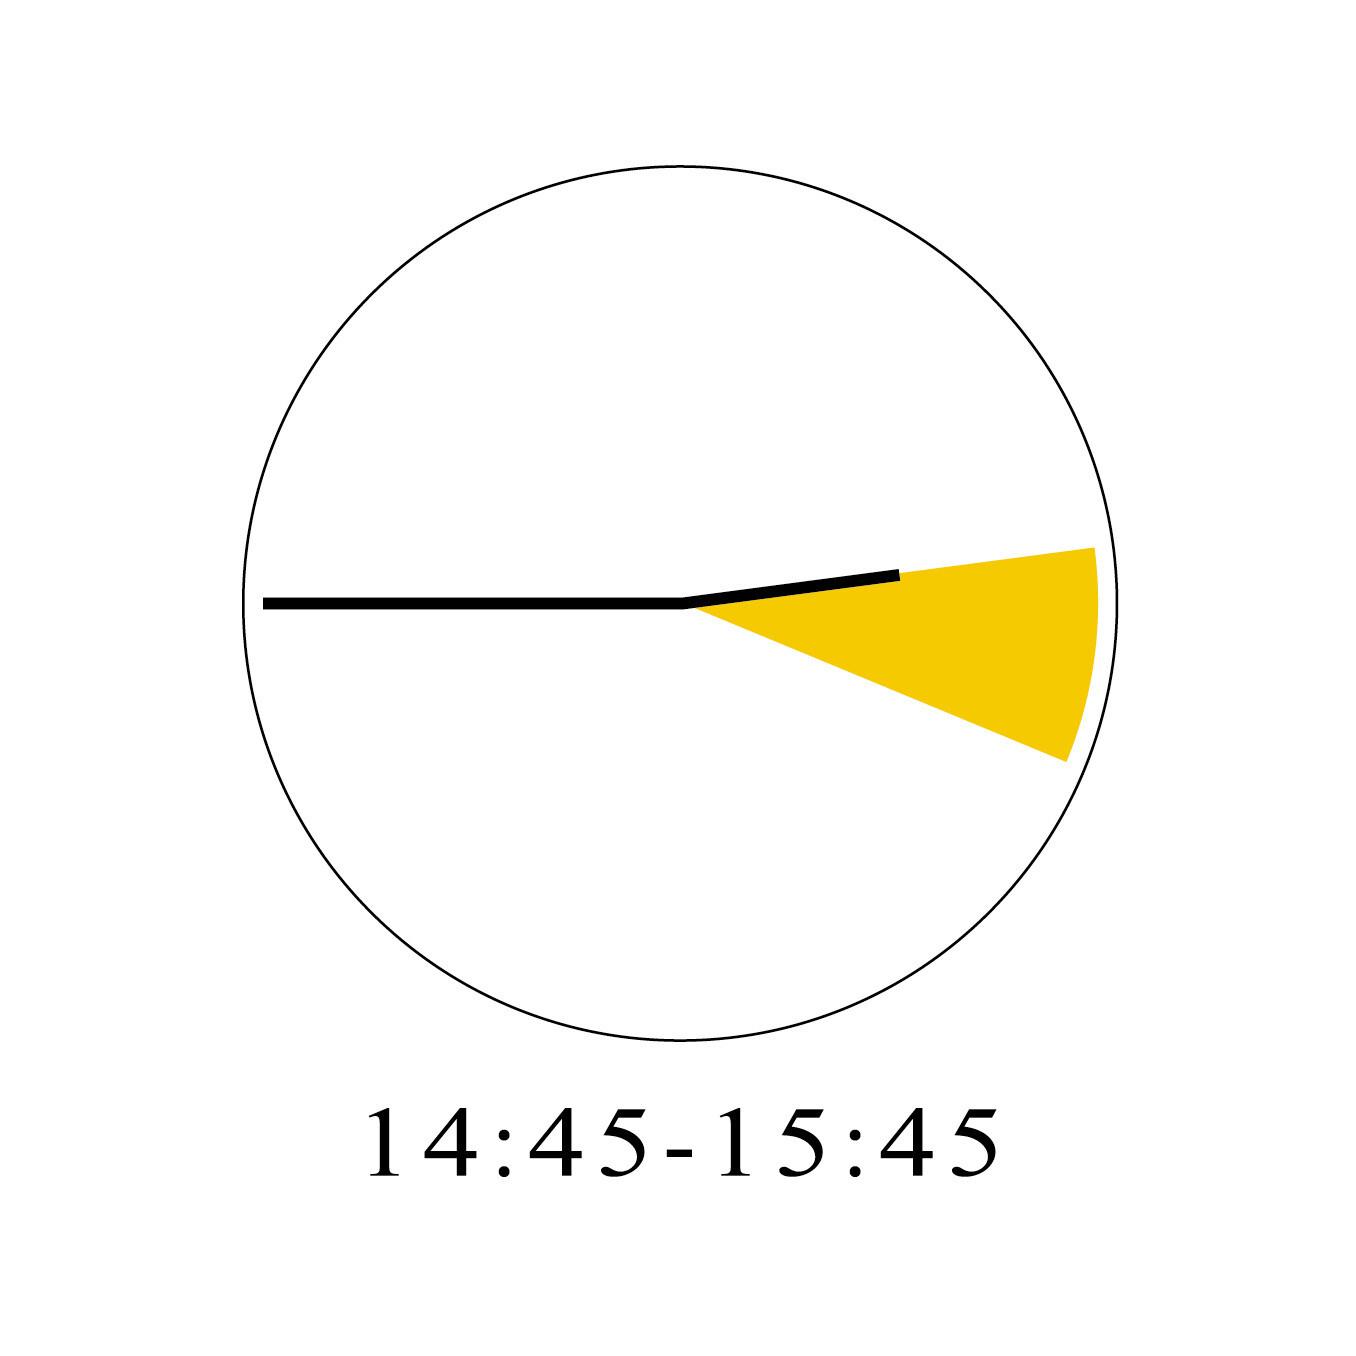 3/13 14:45-15:45